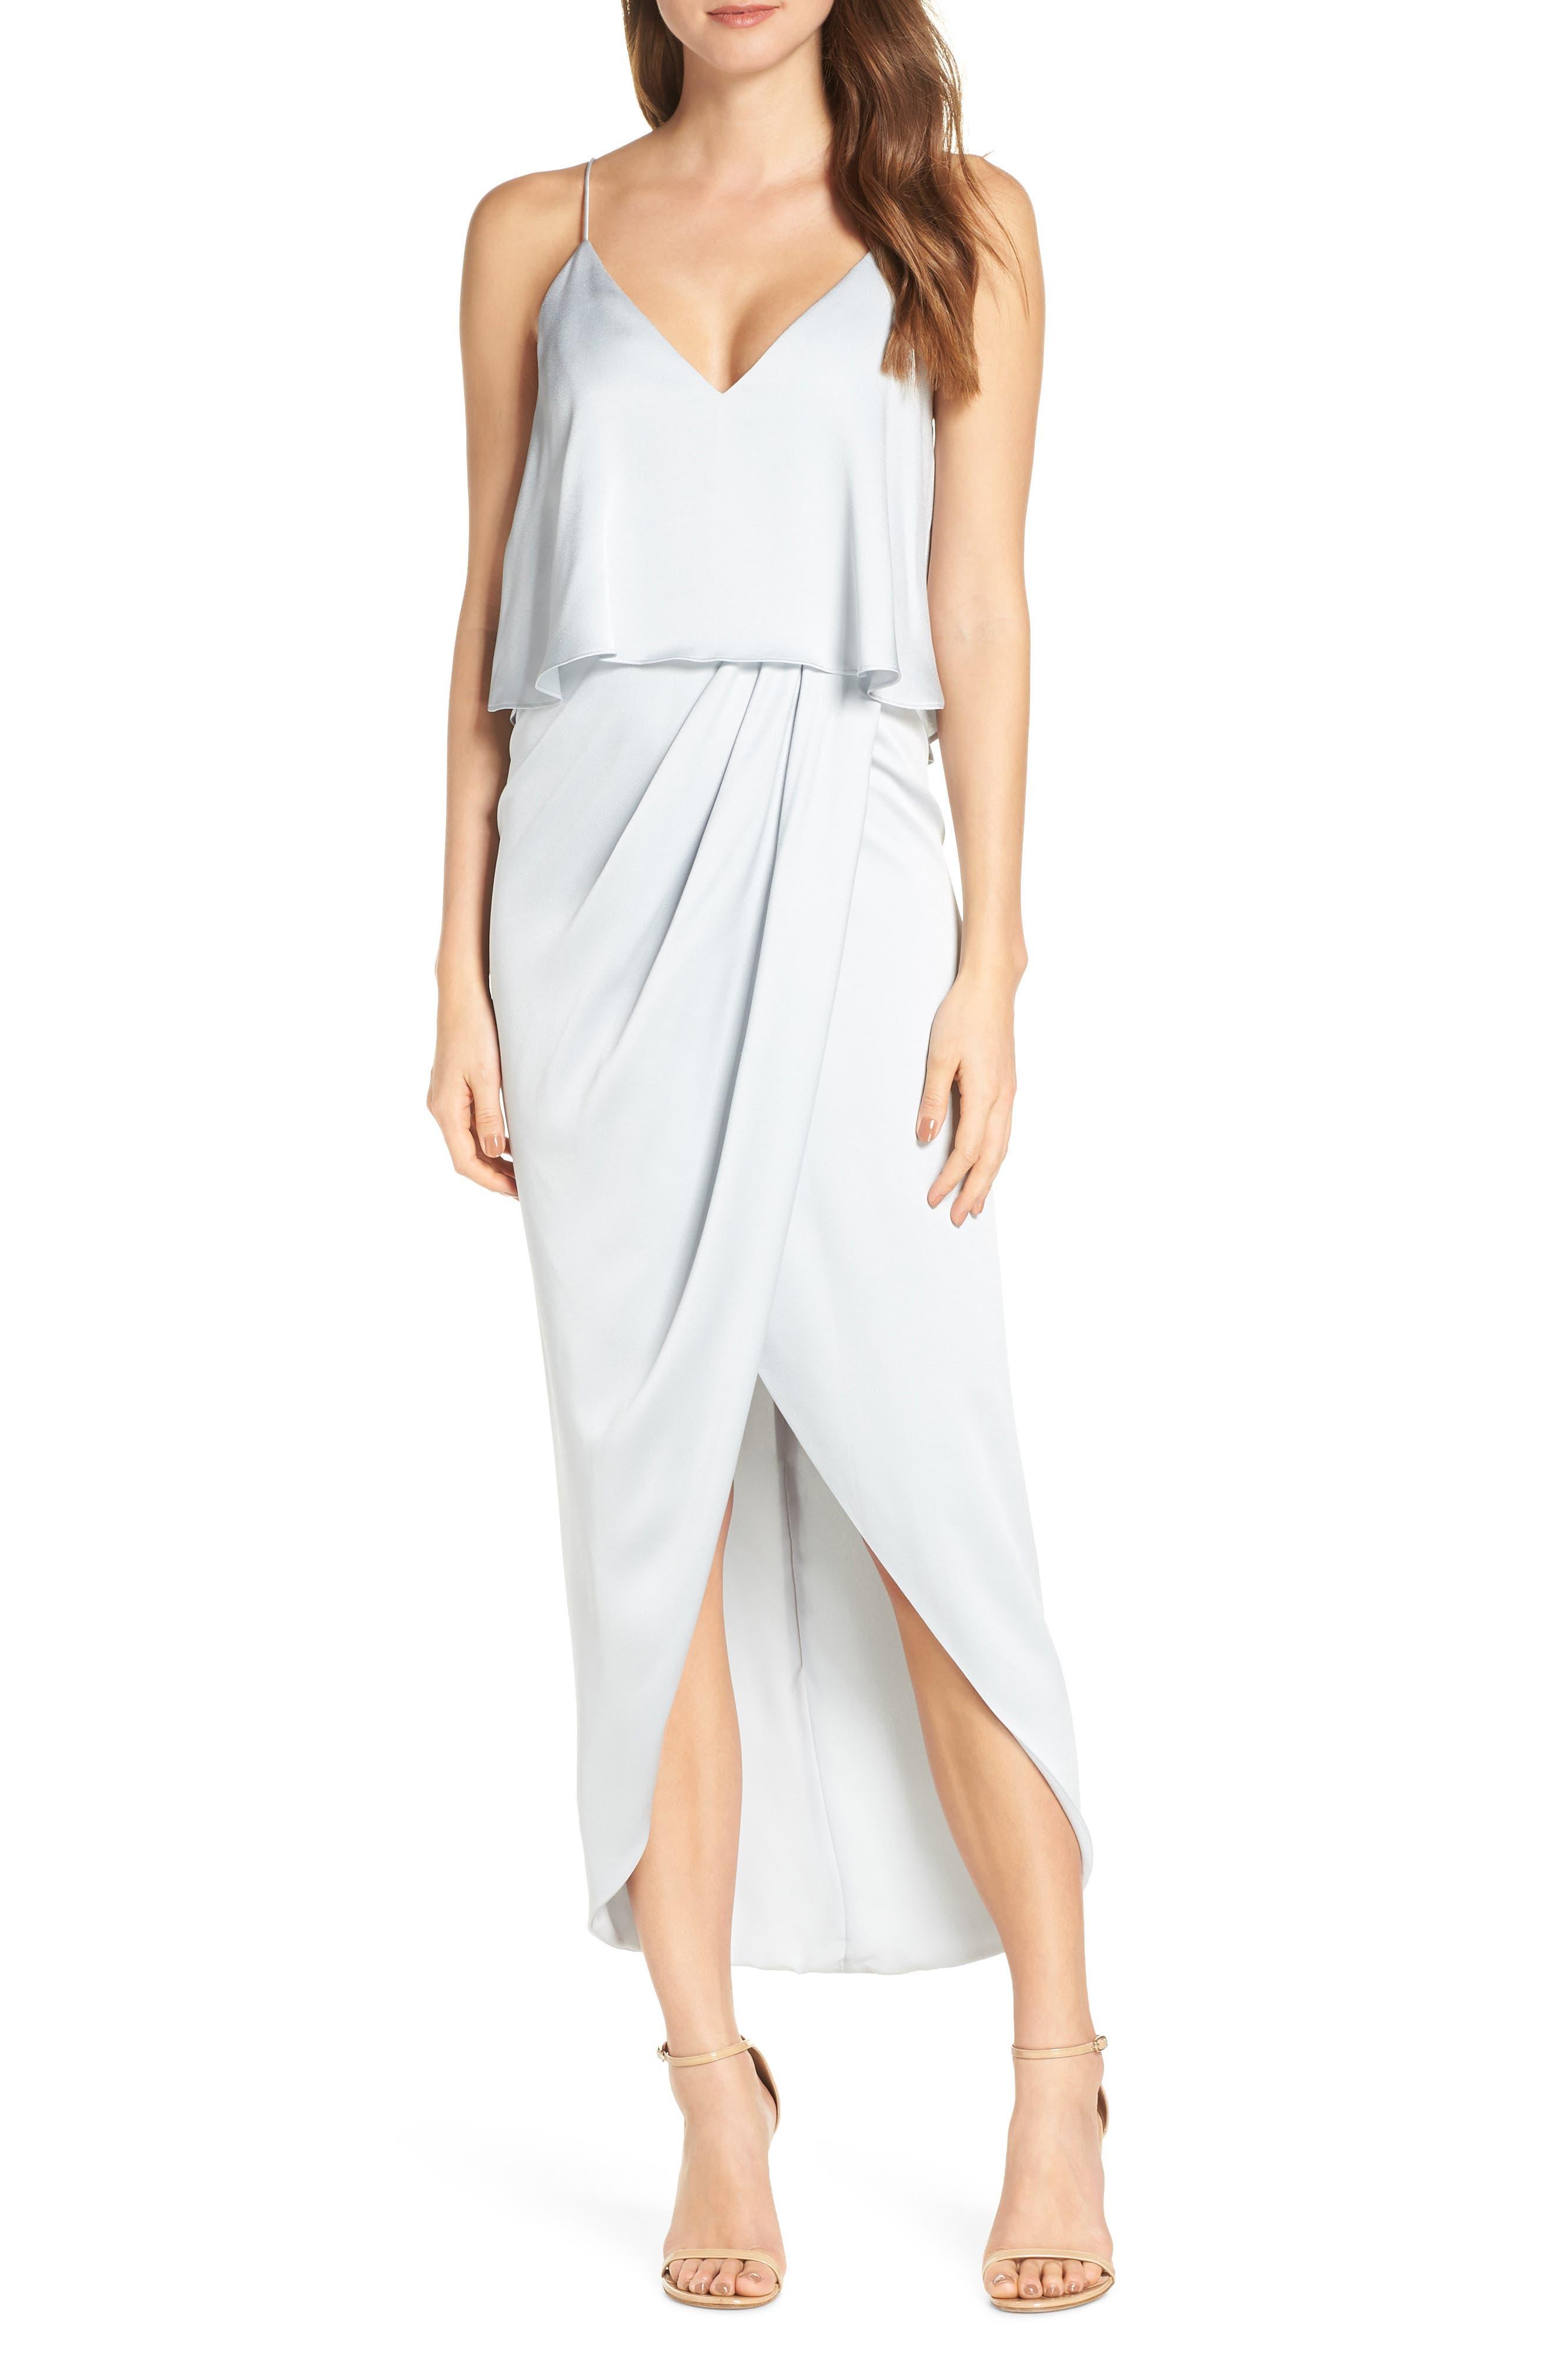 Shona Joy Luxe Frill Tulip Hem Maxi Dress, Blue